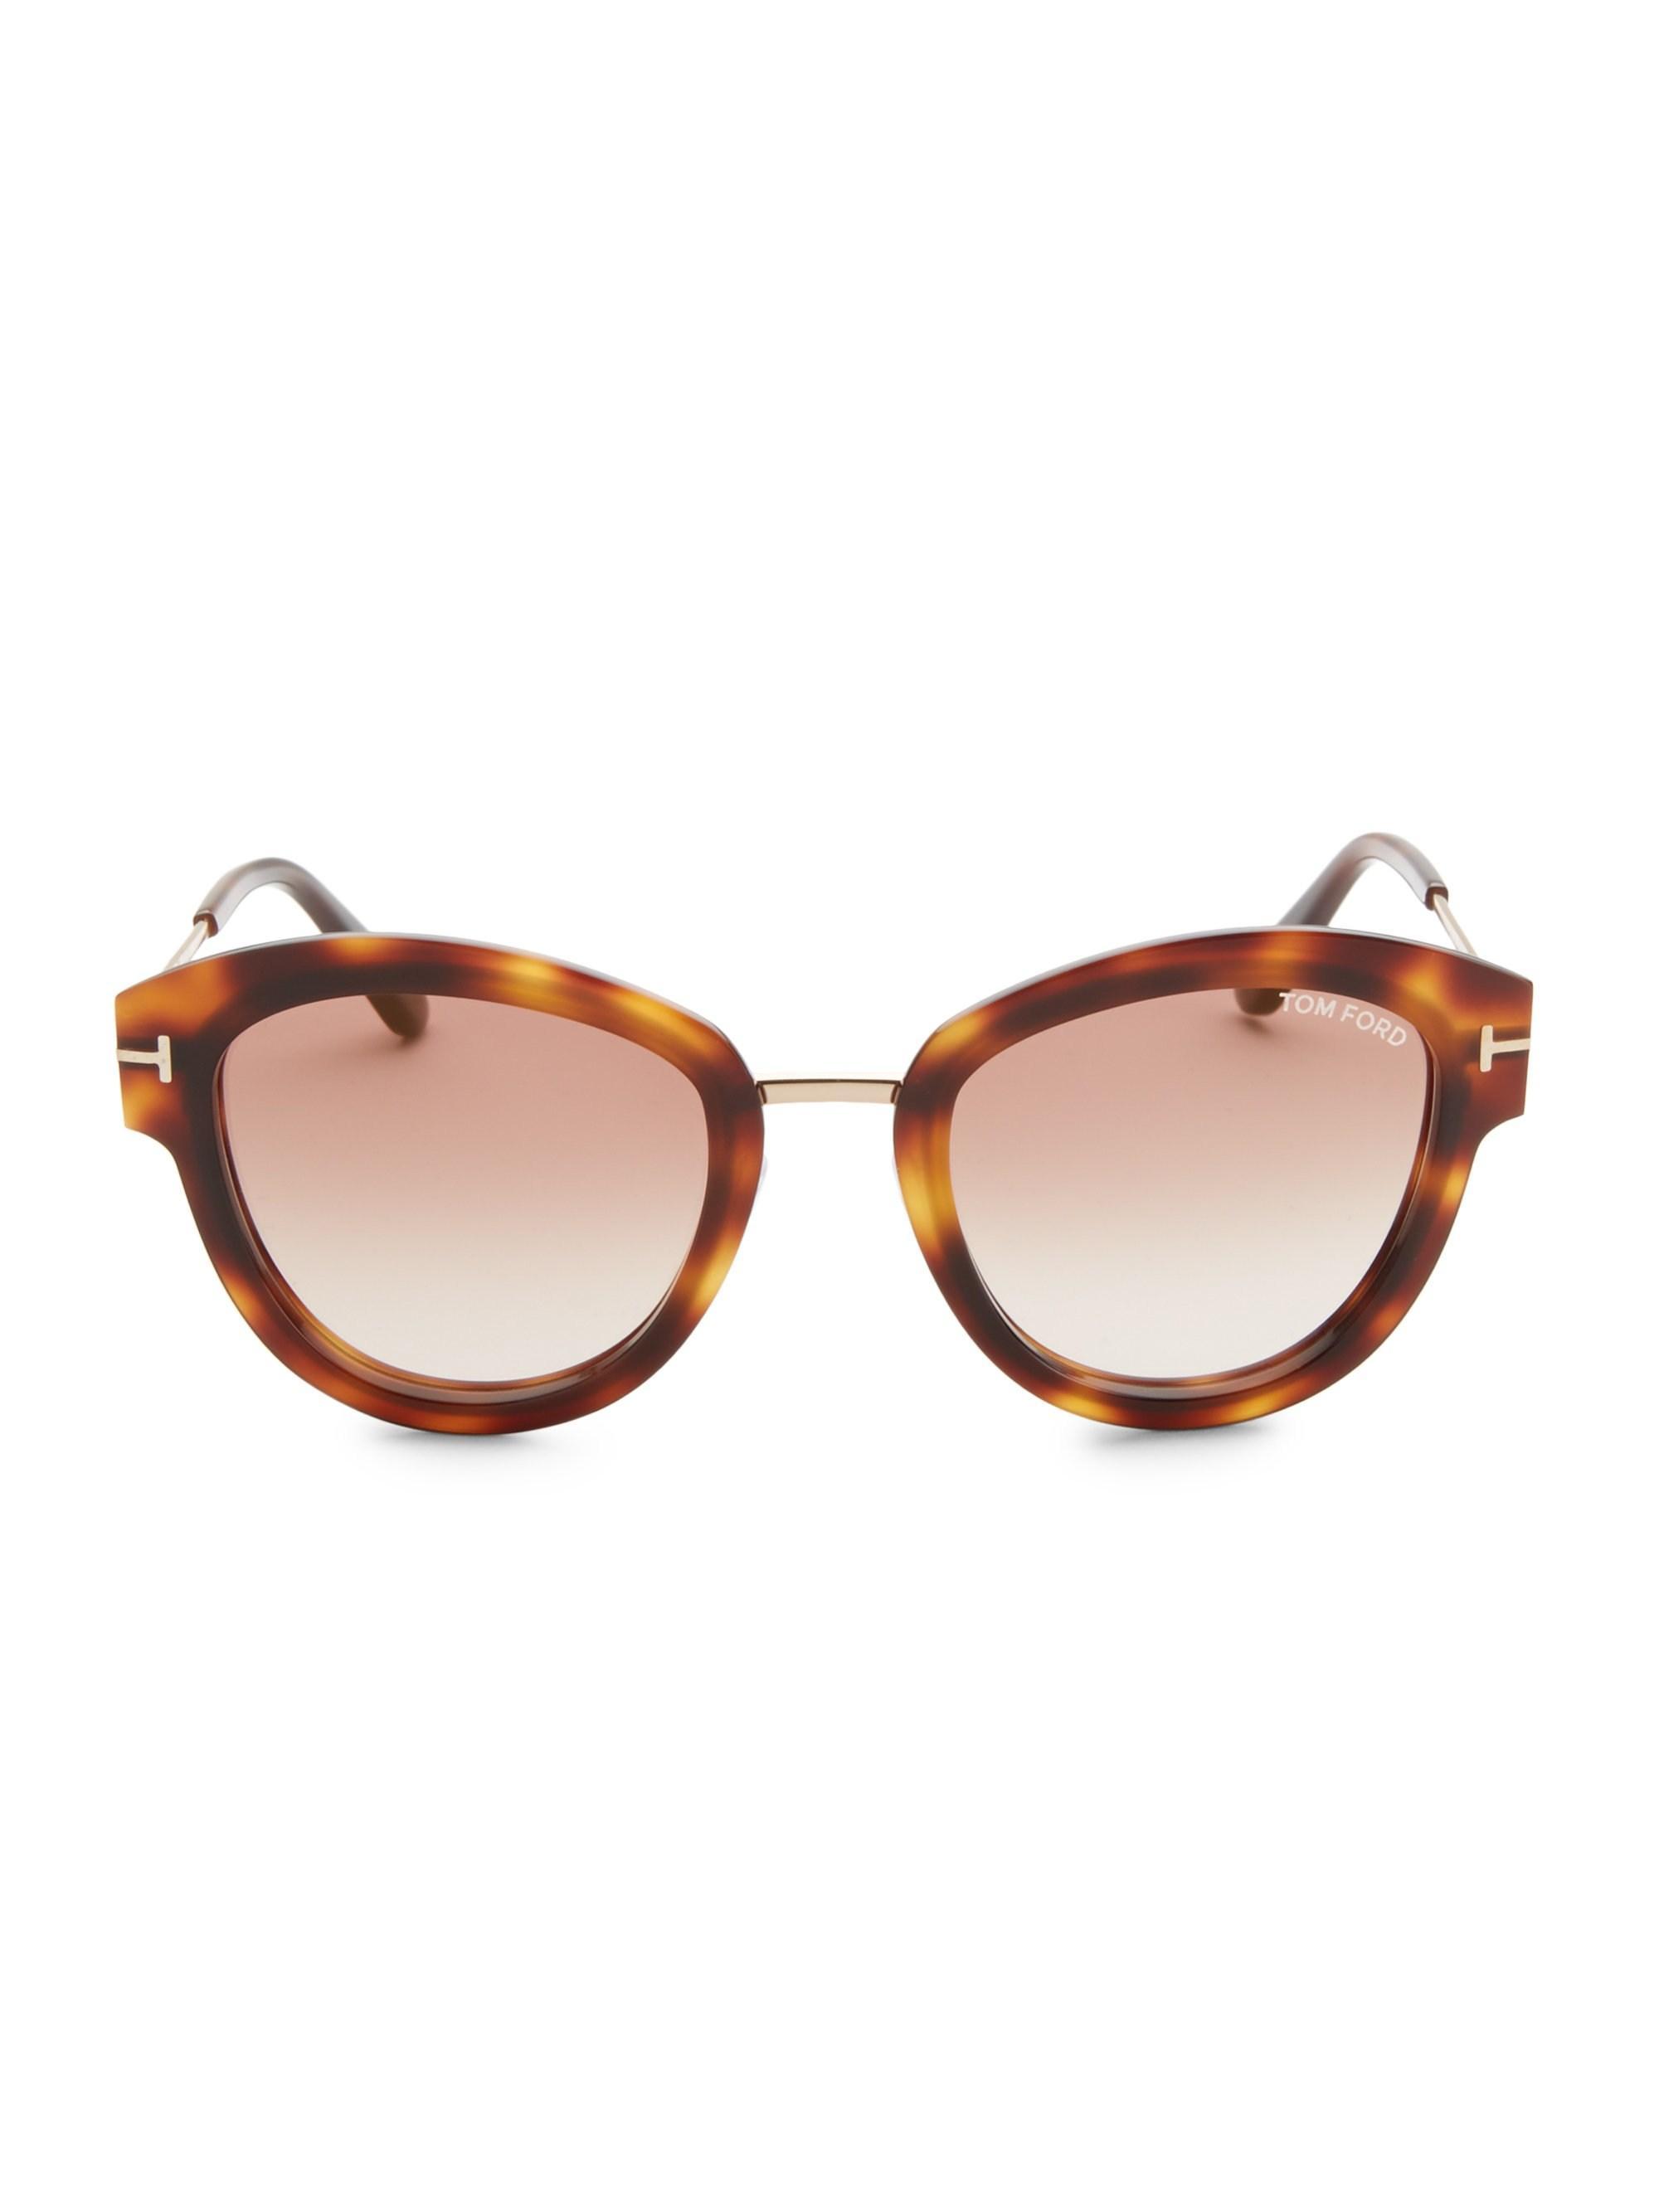 4c33b82d981 Tom Ford - Brown Mia Tortoiseshell Sunglasses - Lyst. View fullscreen